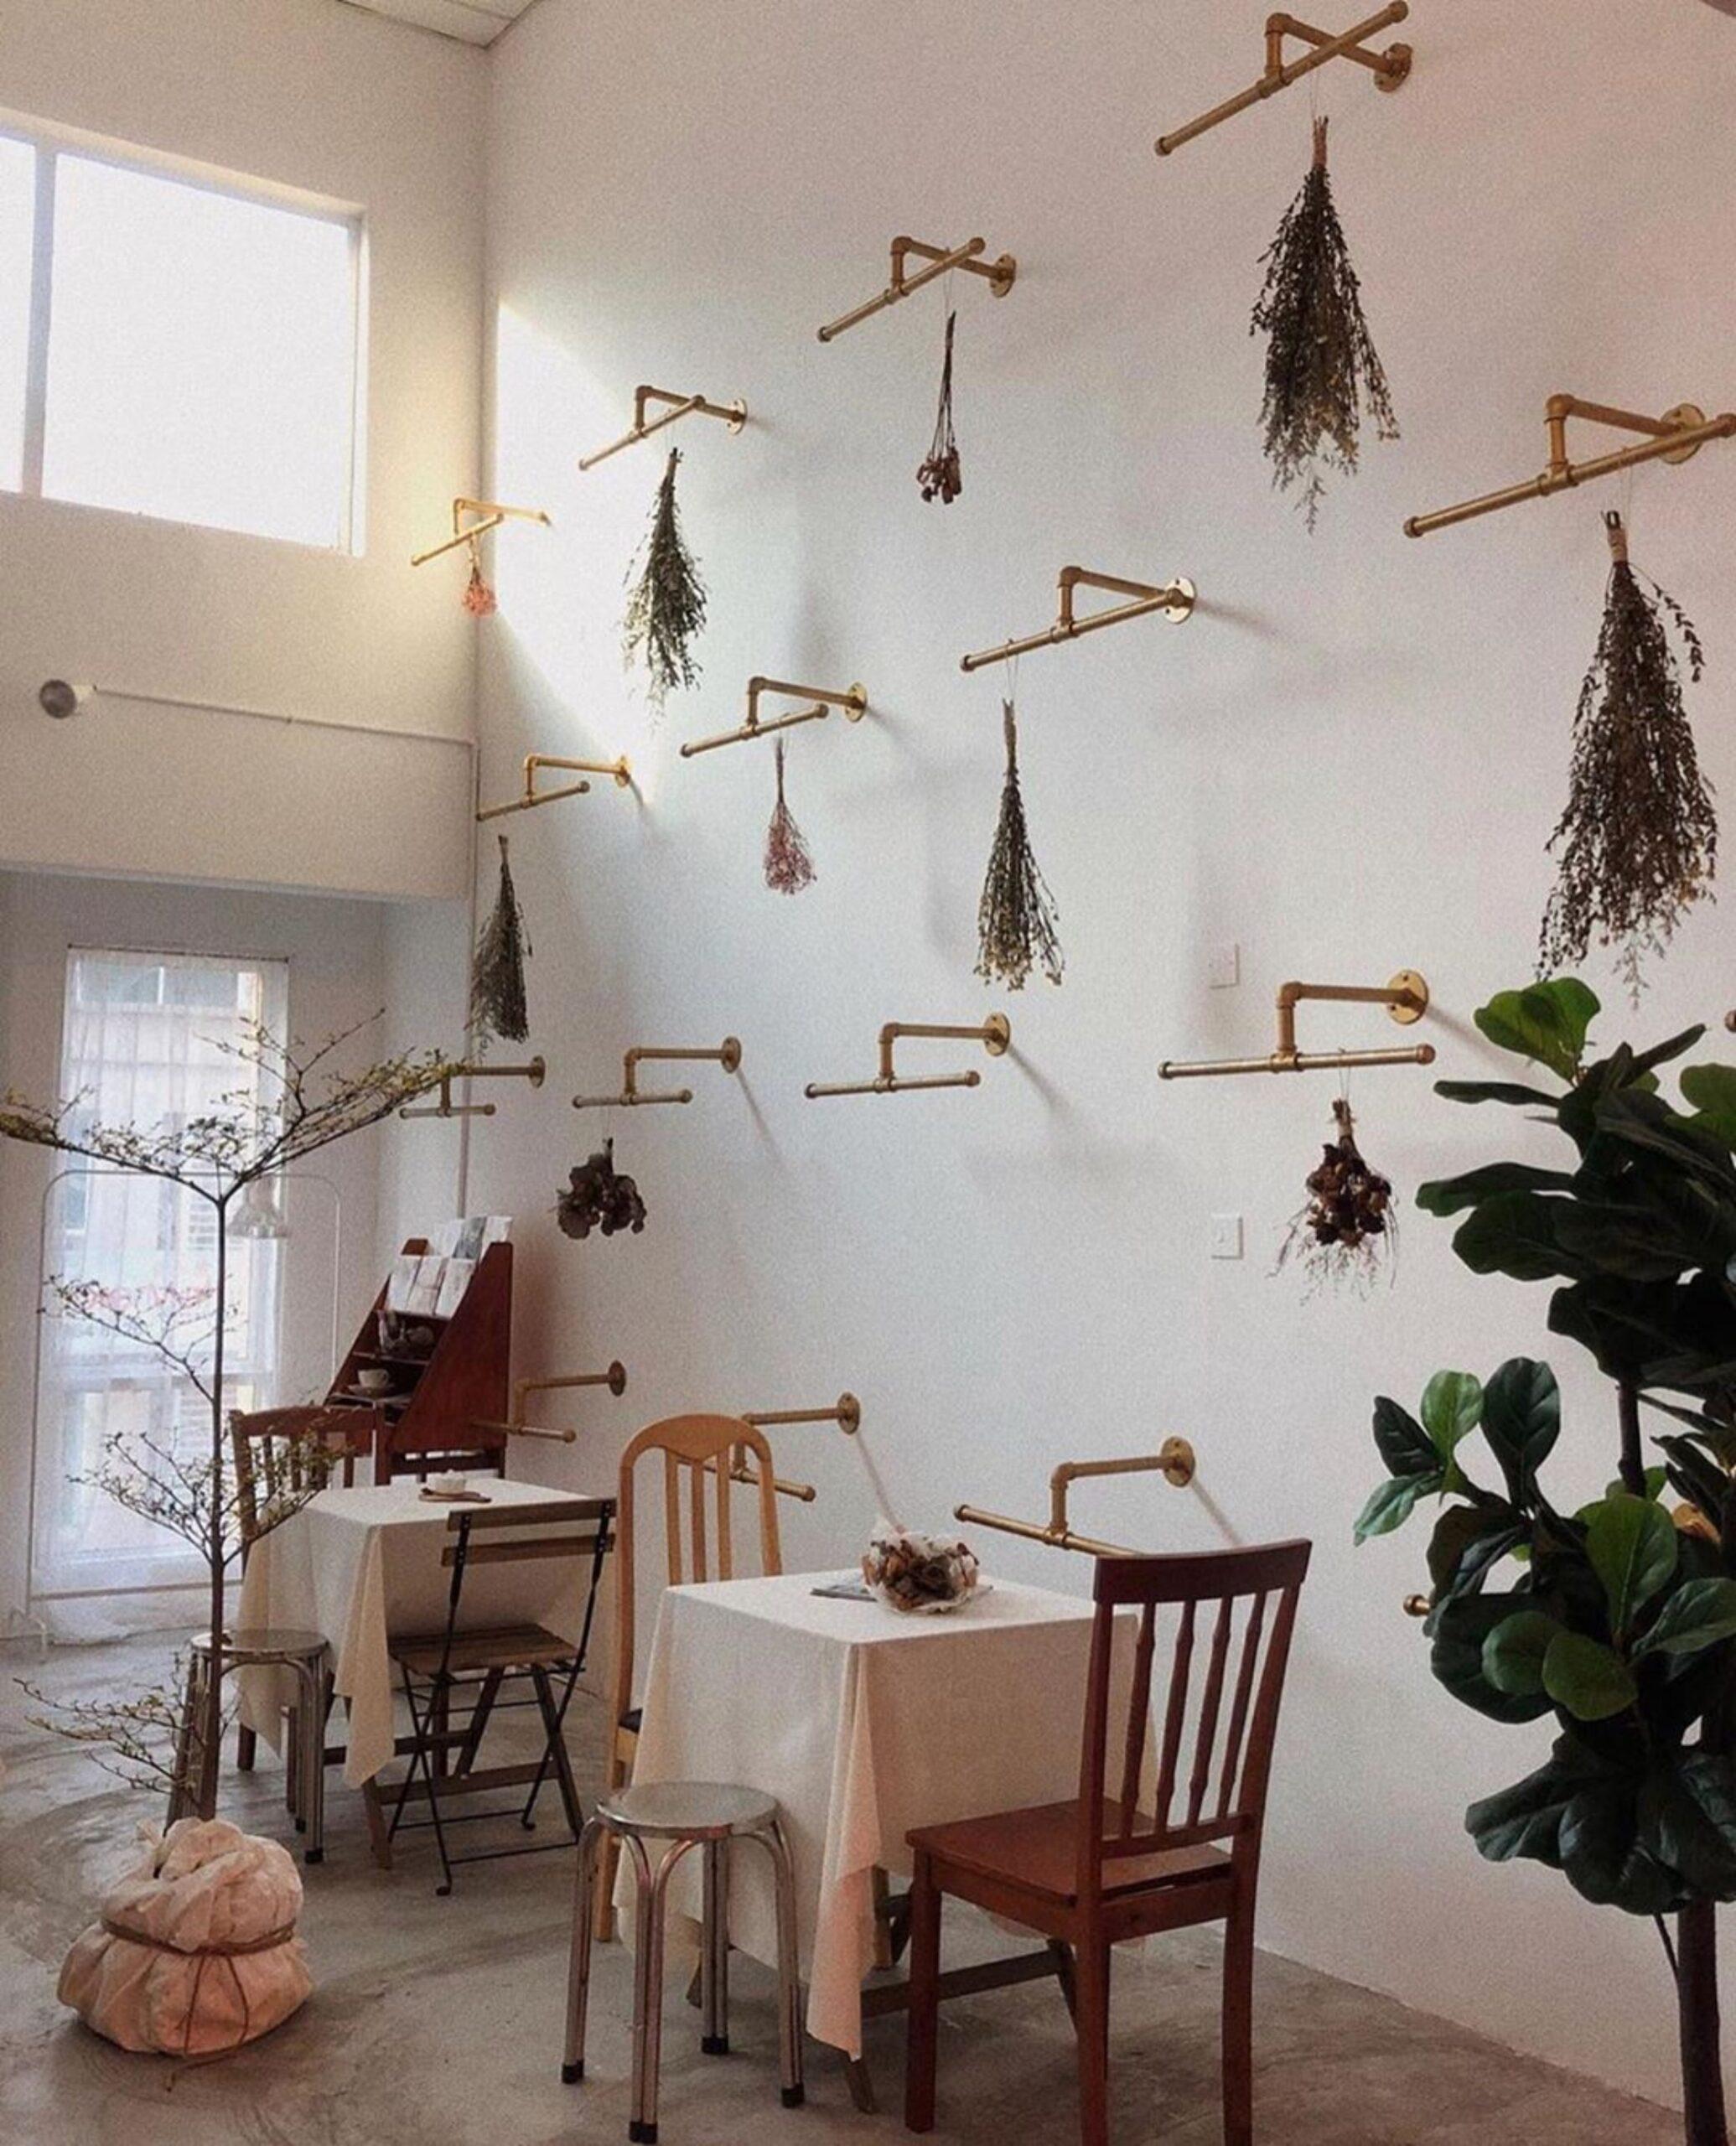 UNIQUE INSTAGRAMMABLE CAFES IN SELANGOR 12